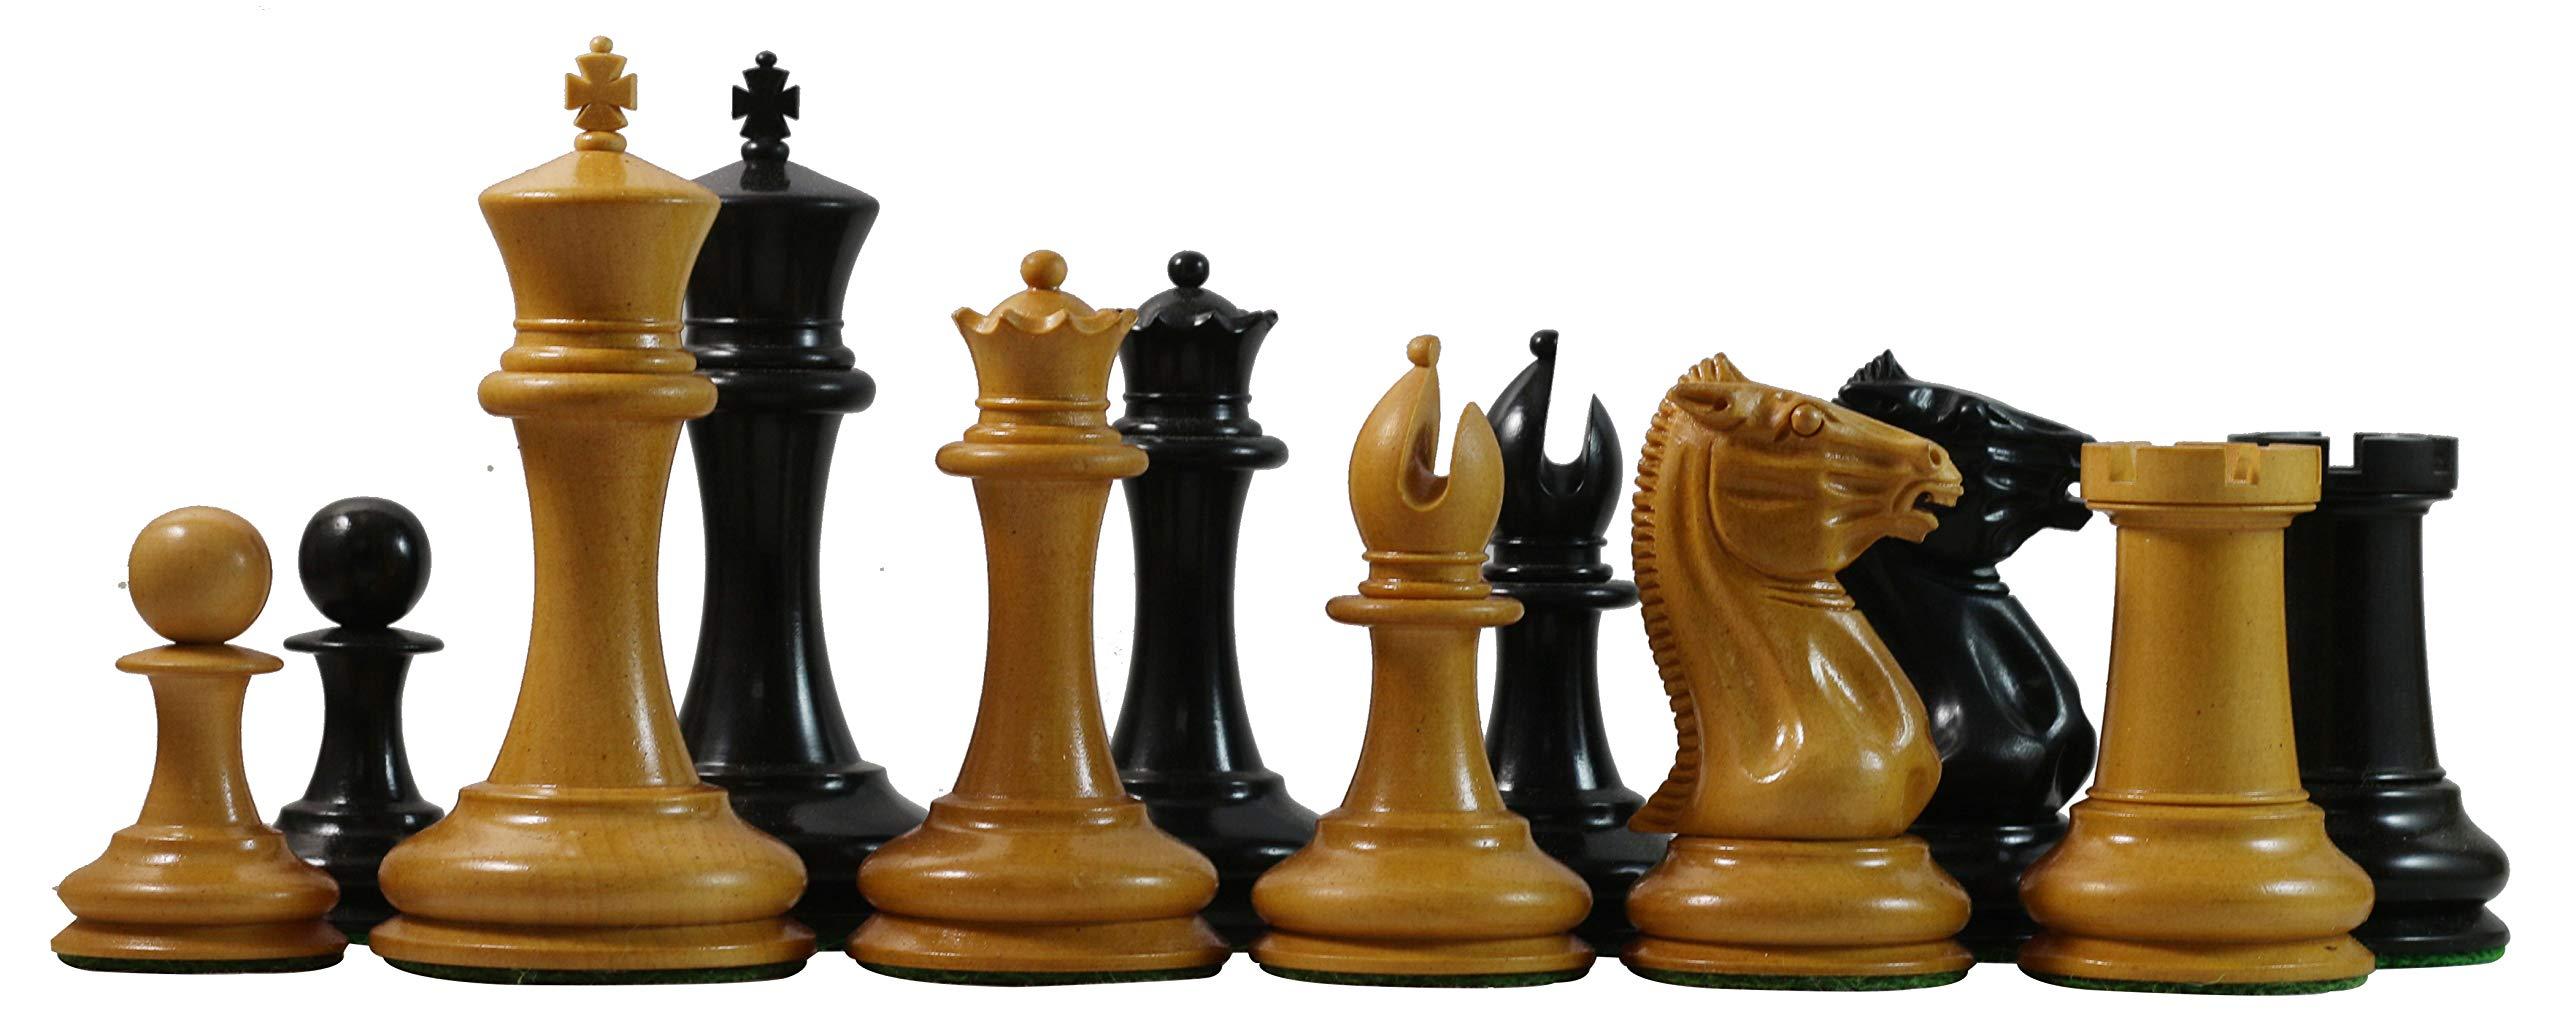 "Staunton Castle, Vintage 1849-50 Reproduction Antiqued Morphy Cooke 3.5"" Ebony Chess Design"